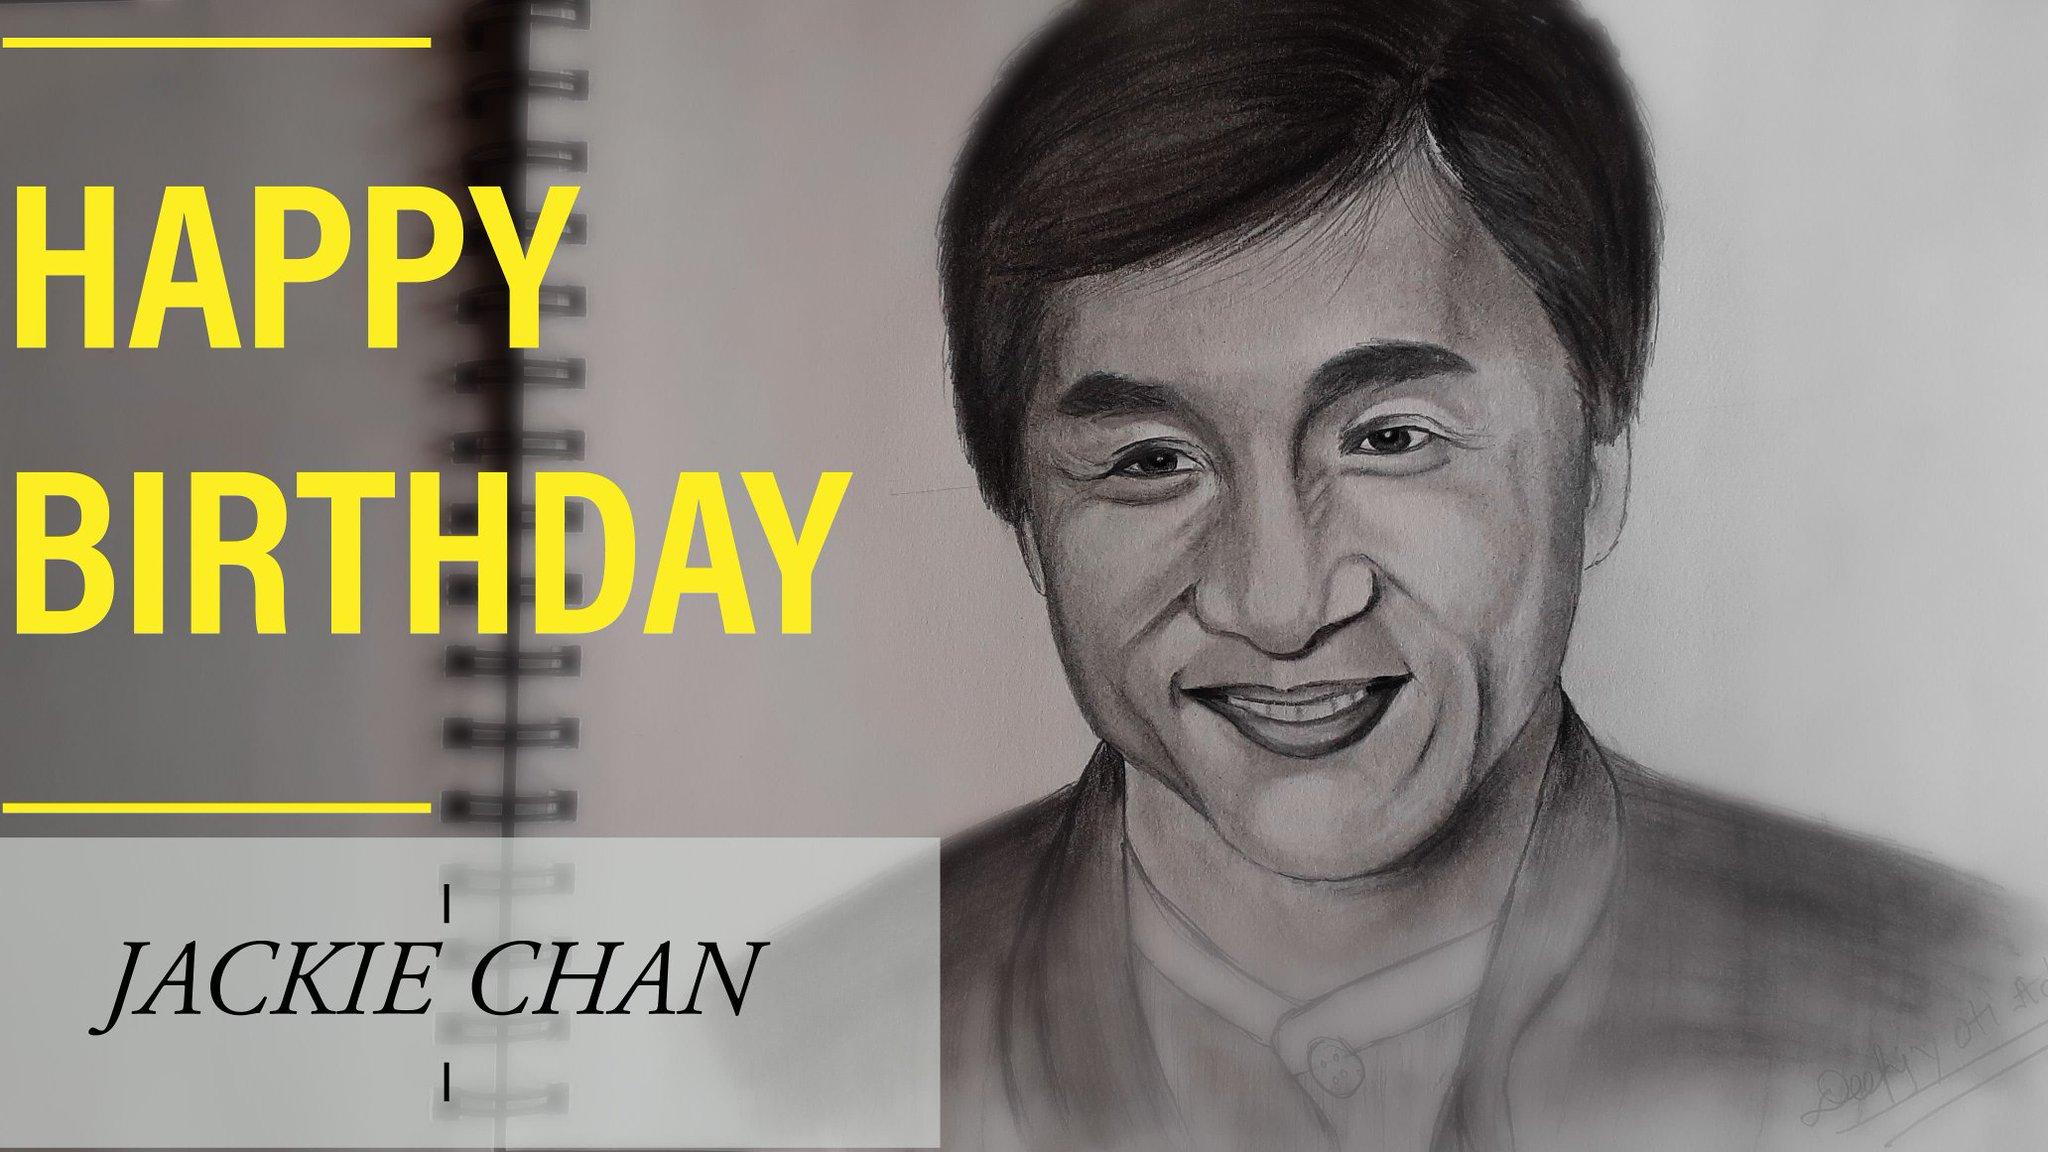 Happy Birthday JACKIE CHAN YouTube video link